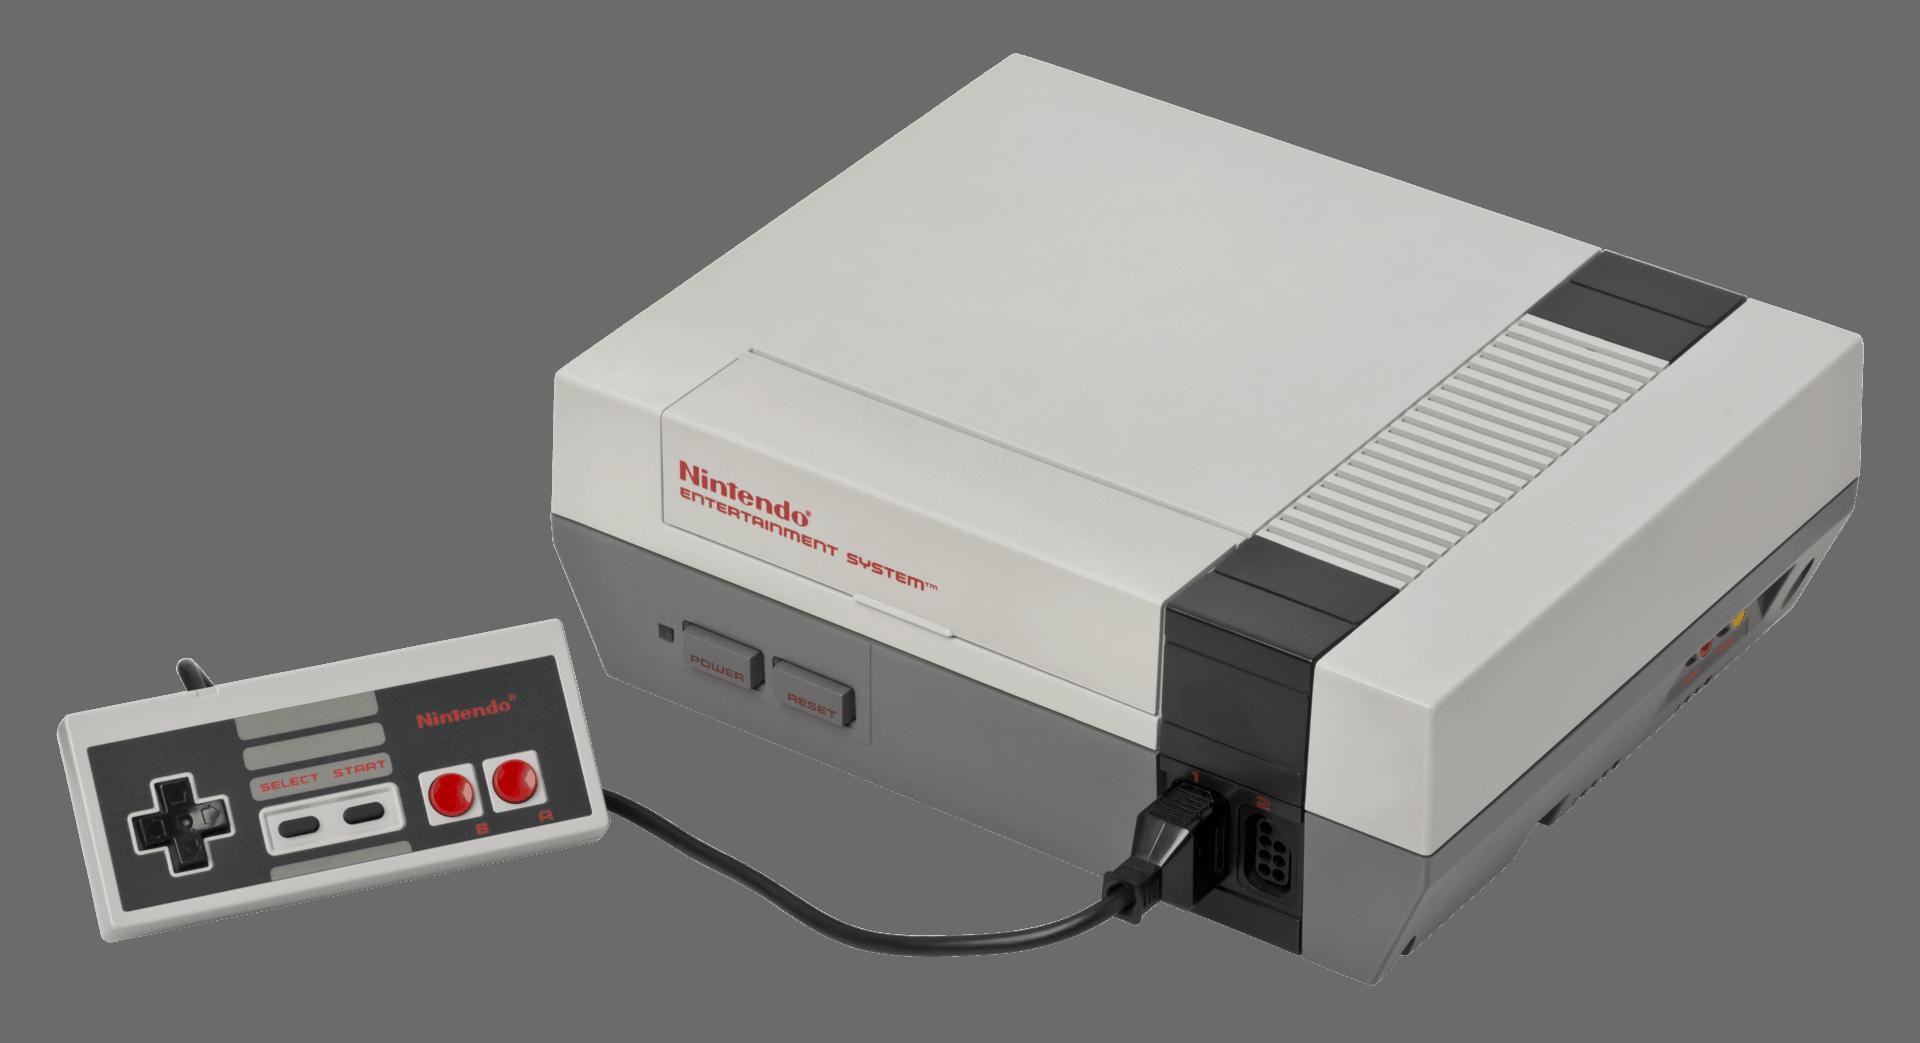 Nintendo Entertainment